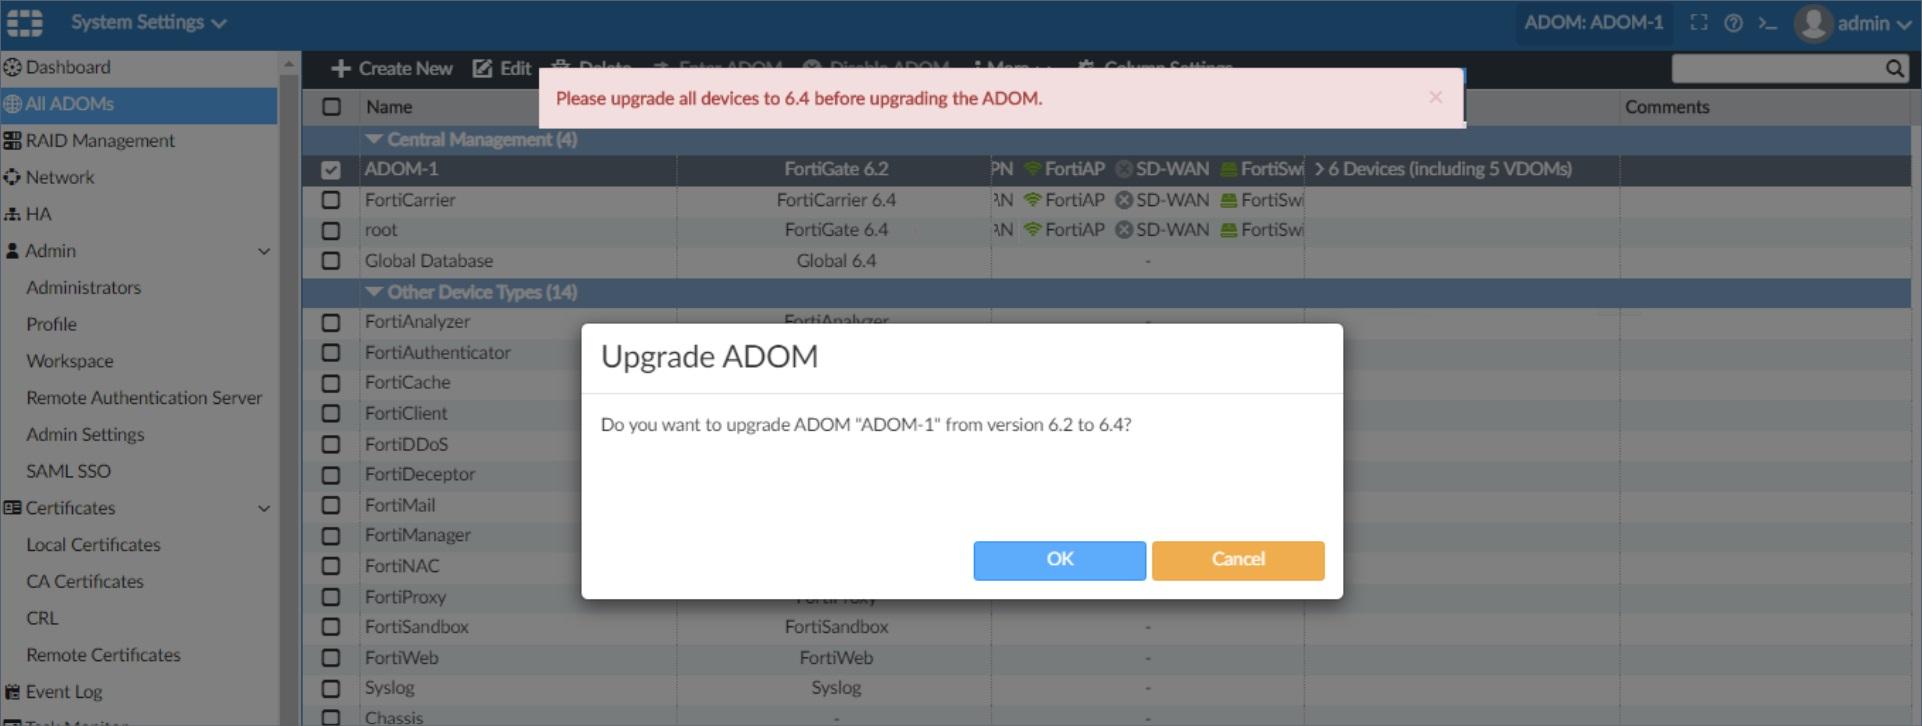 ADOM Upgrade Error